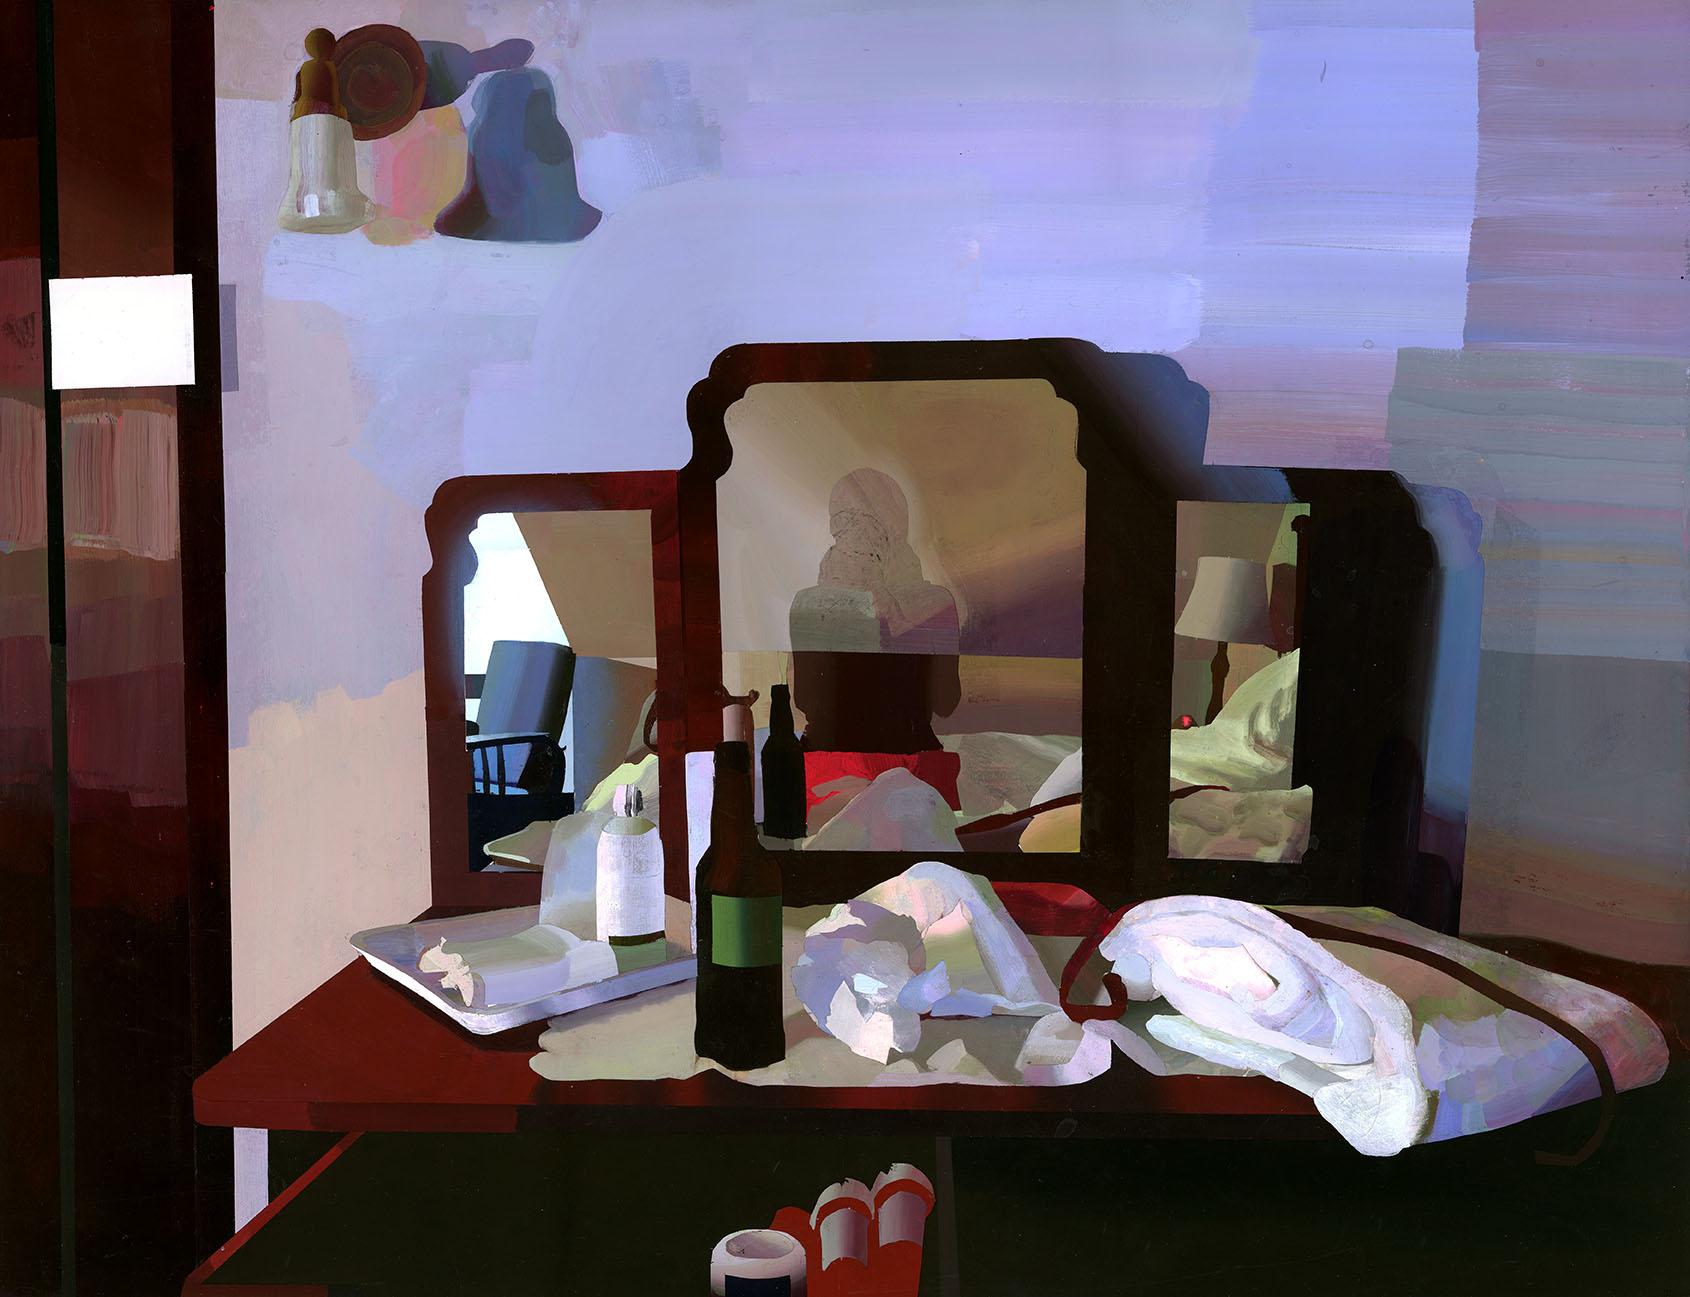 Messy Mirror